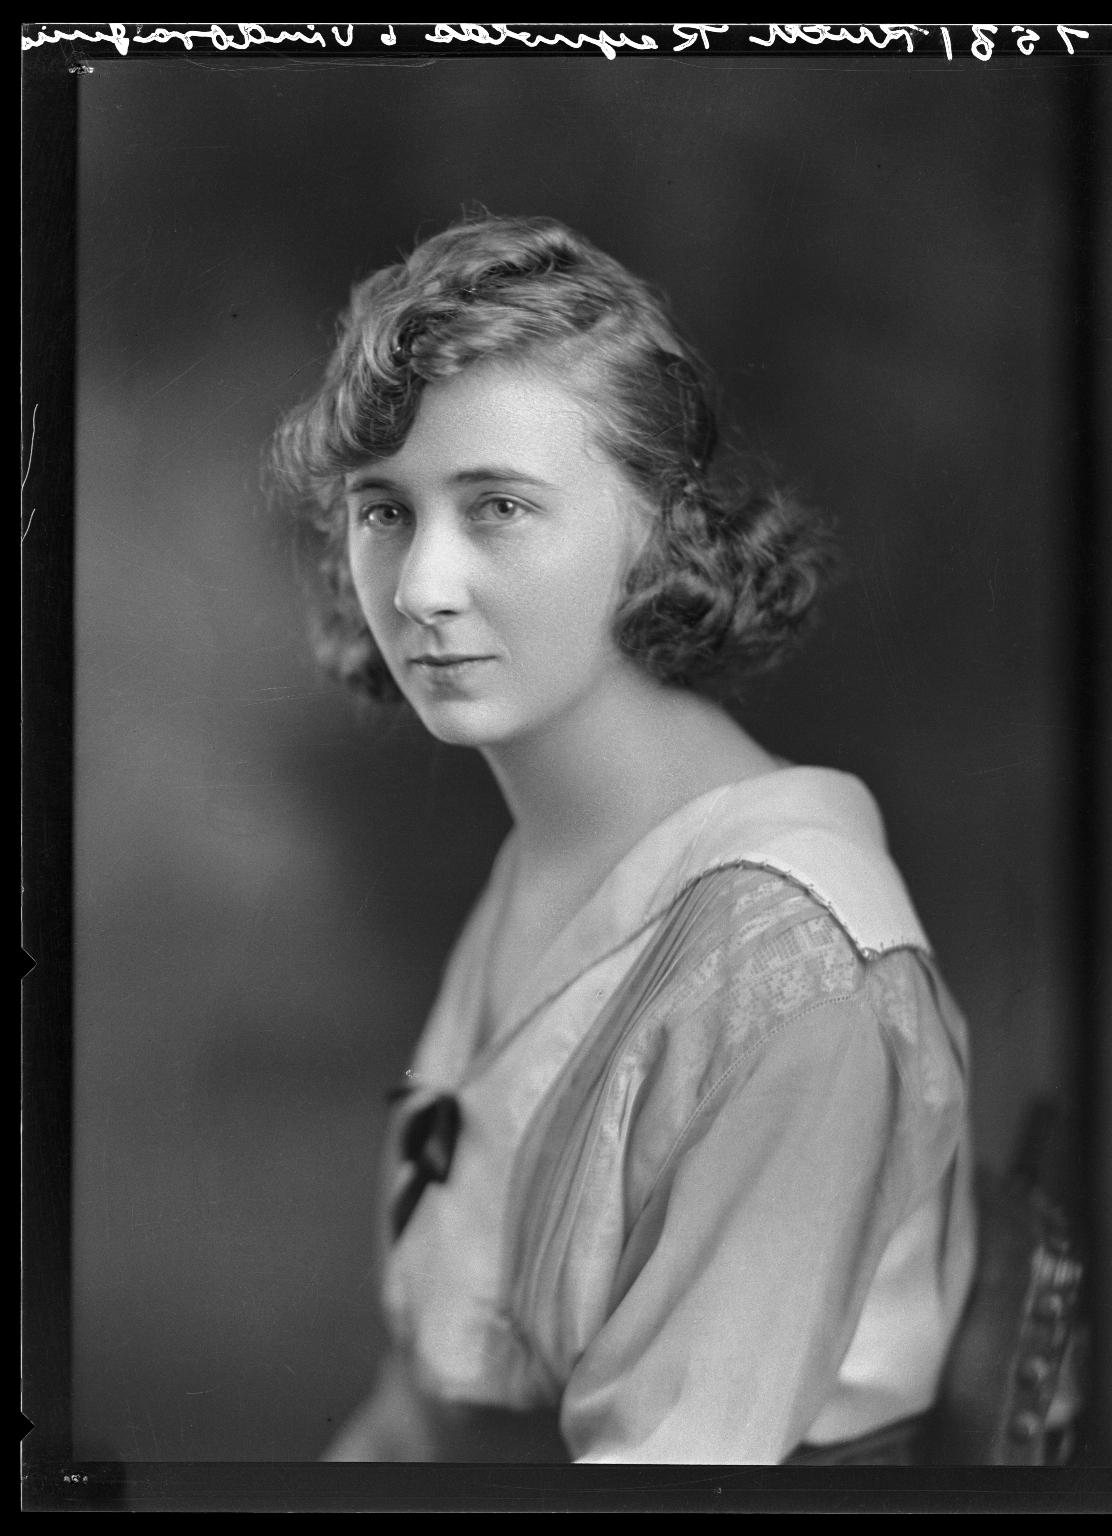 Portraits of Ruth Reynolds